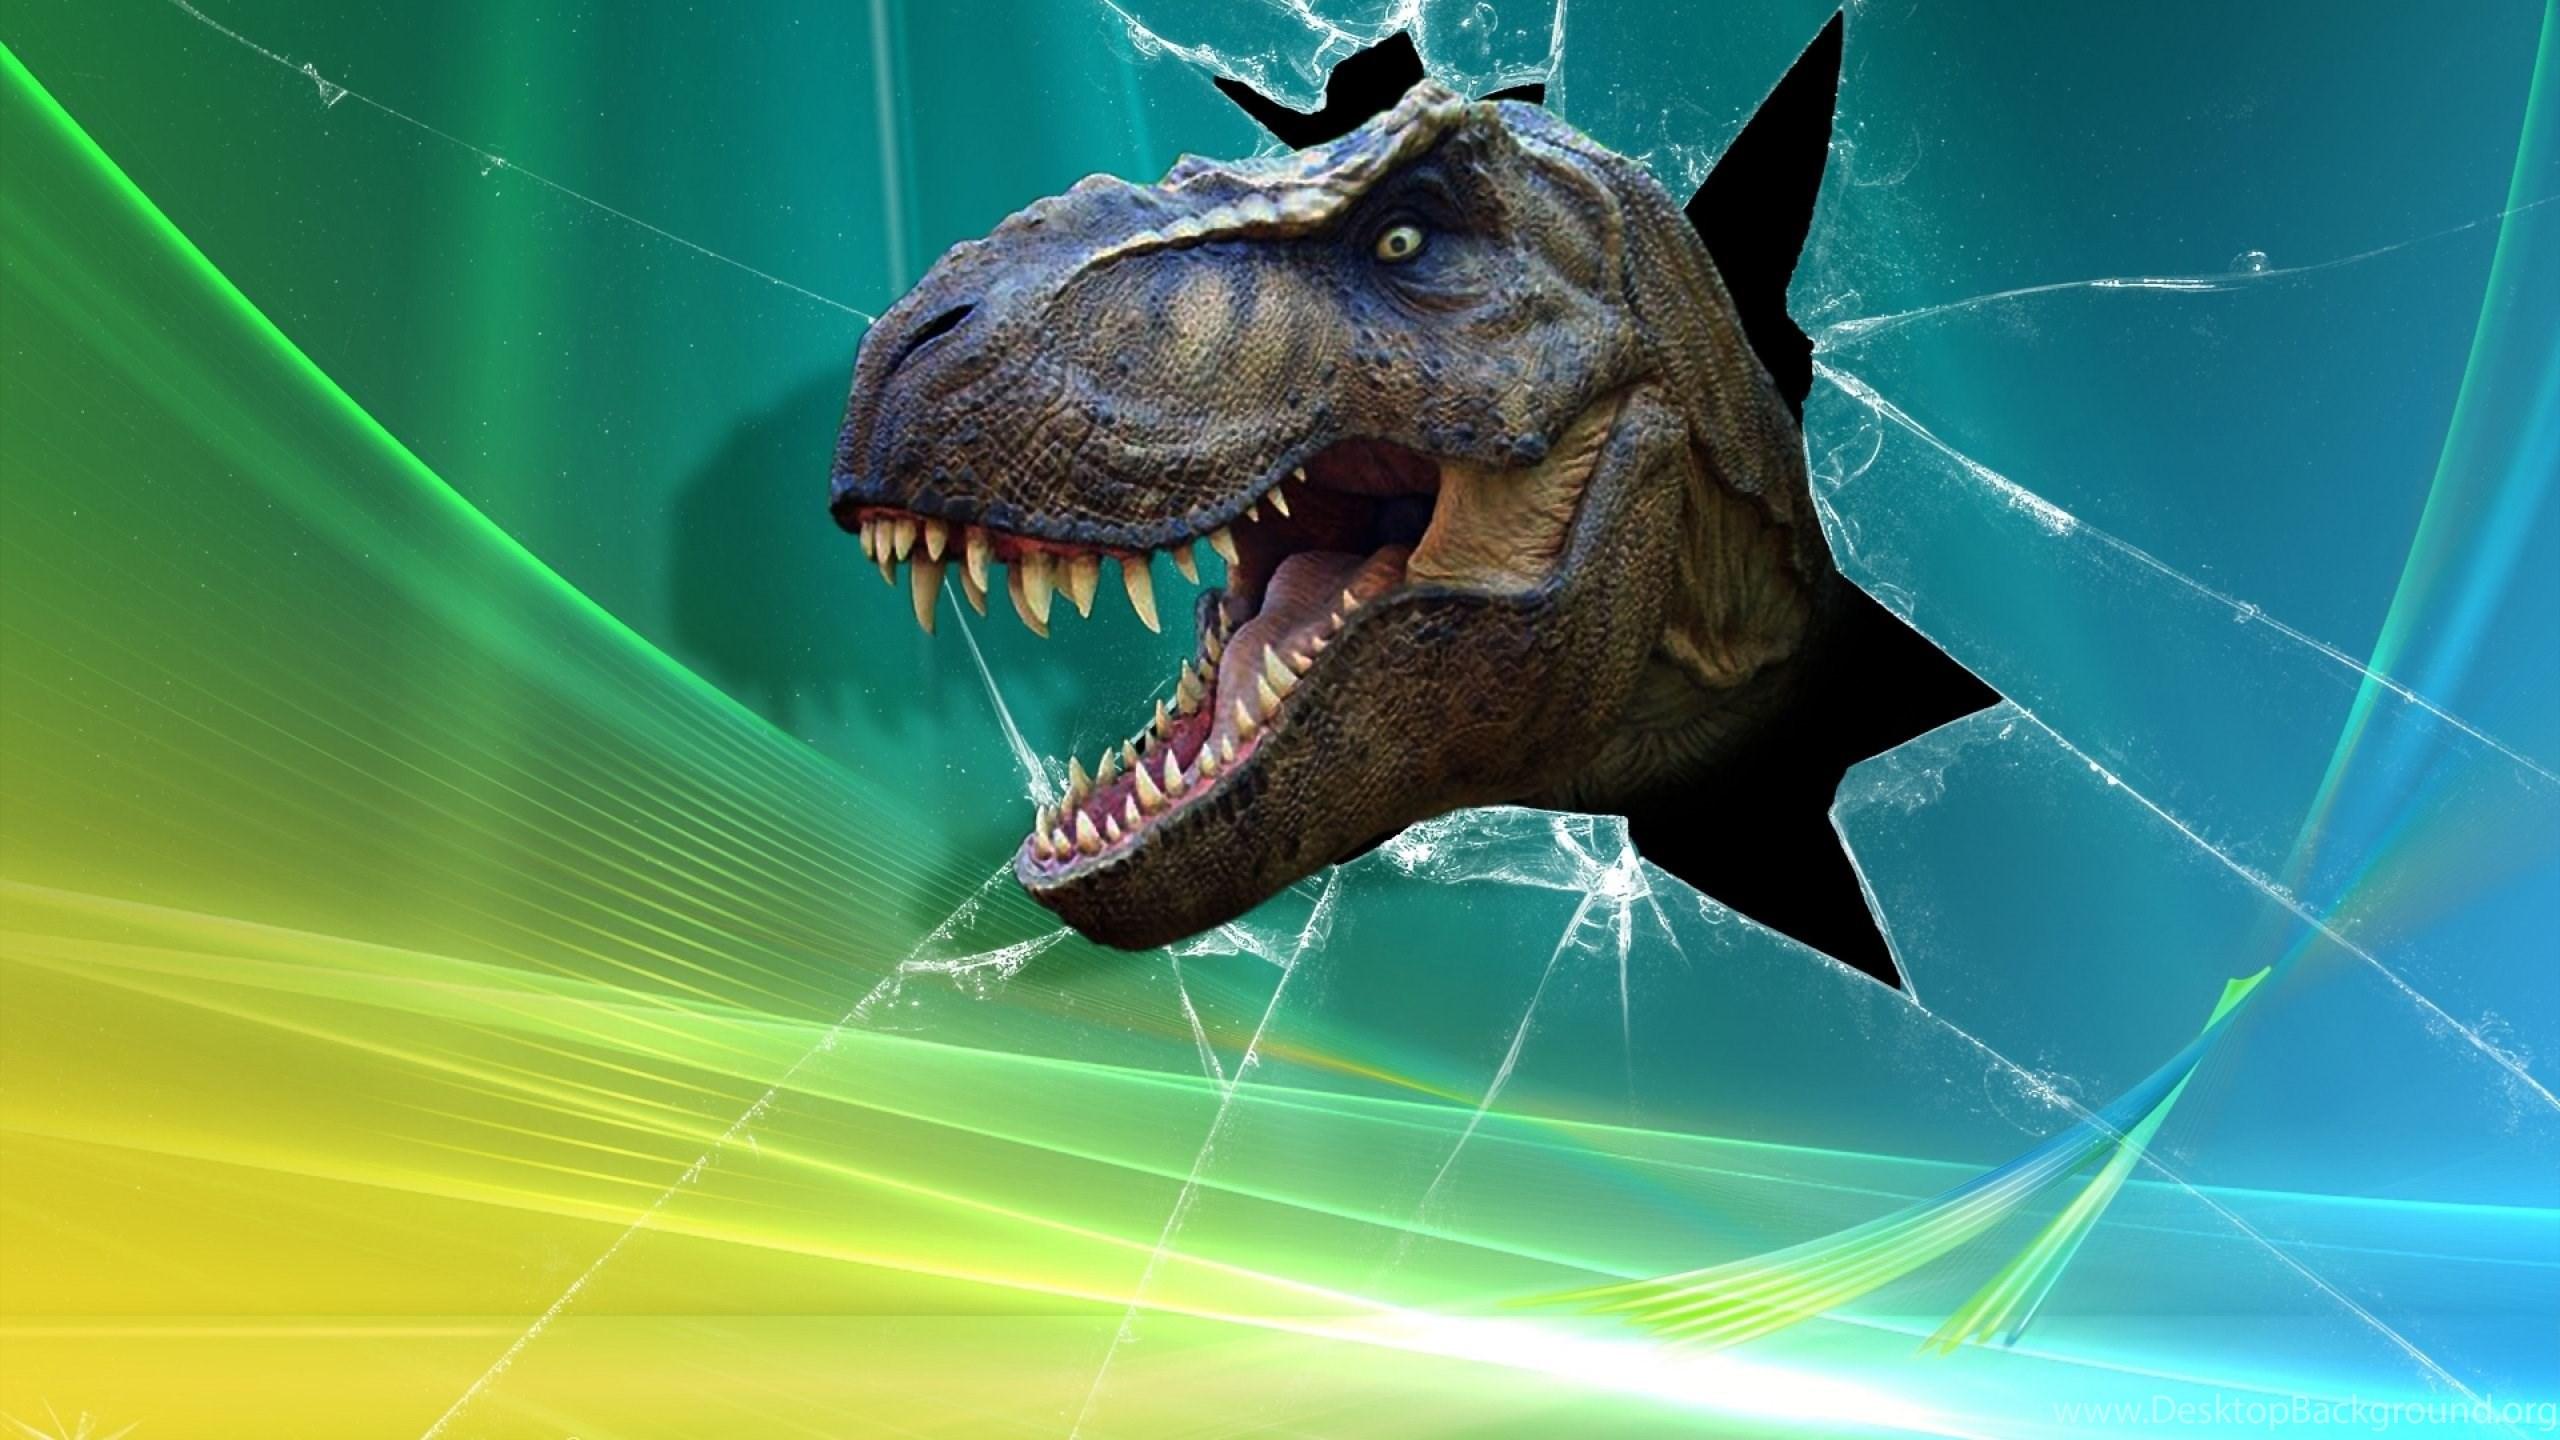 High resolution cracked broken screen dinosaur wallpapers - Cool screensavers for cracked screens ...